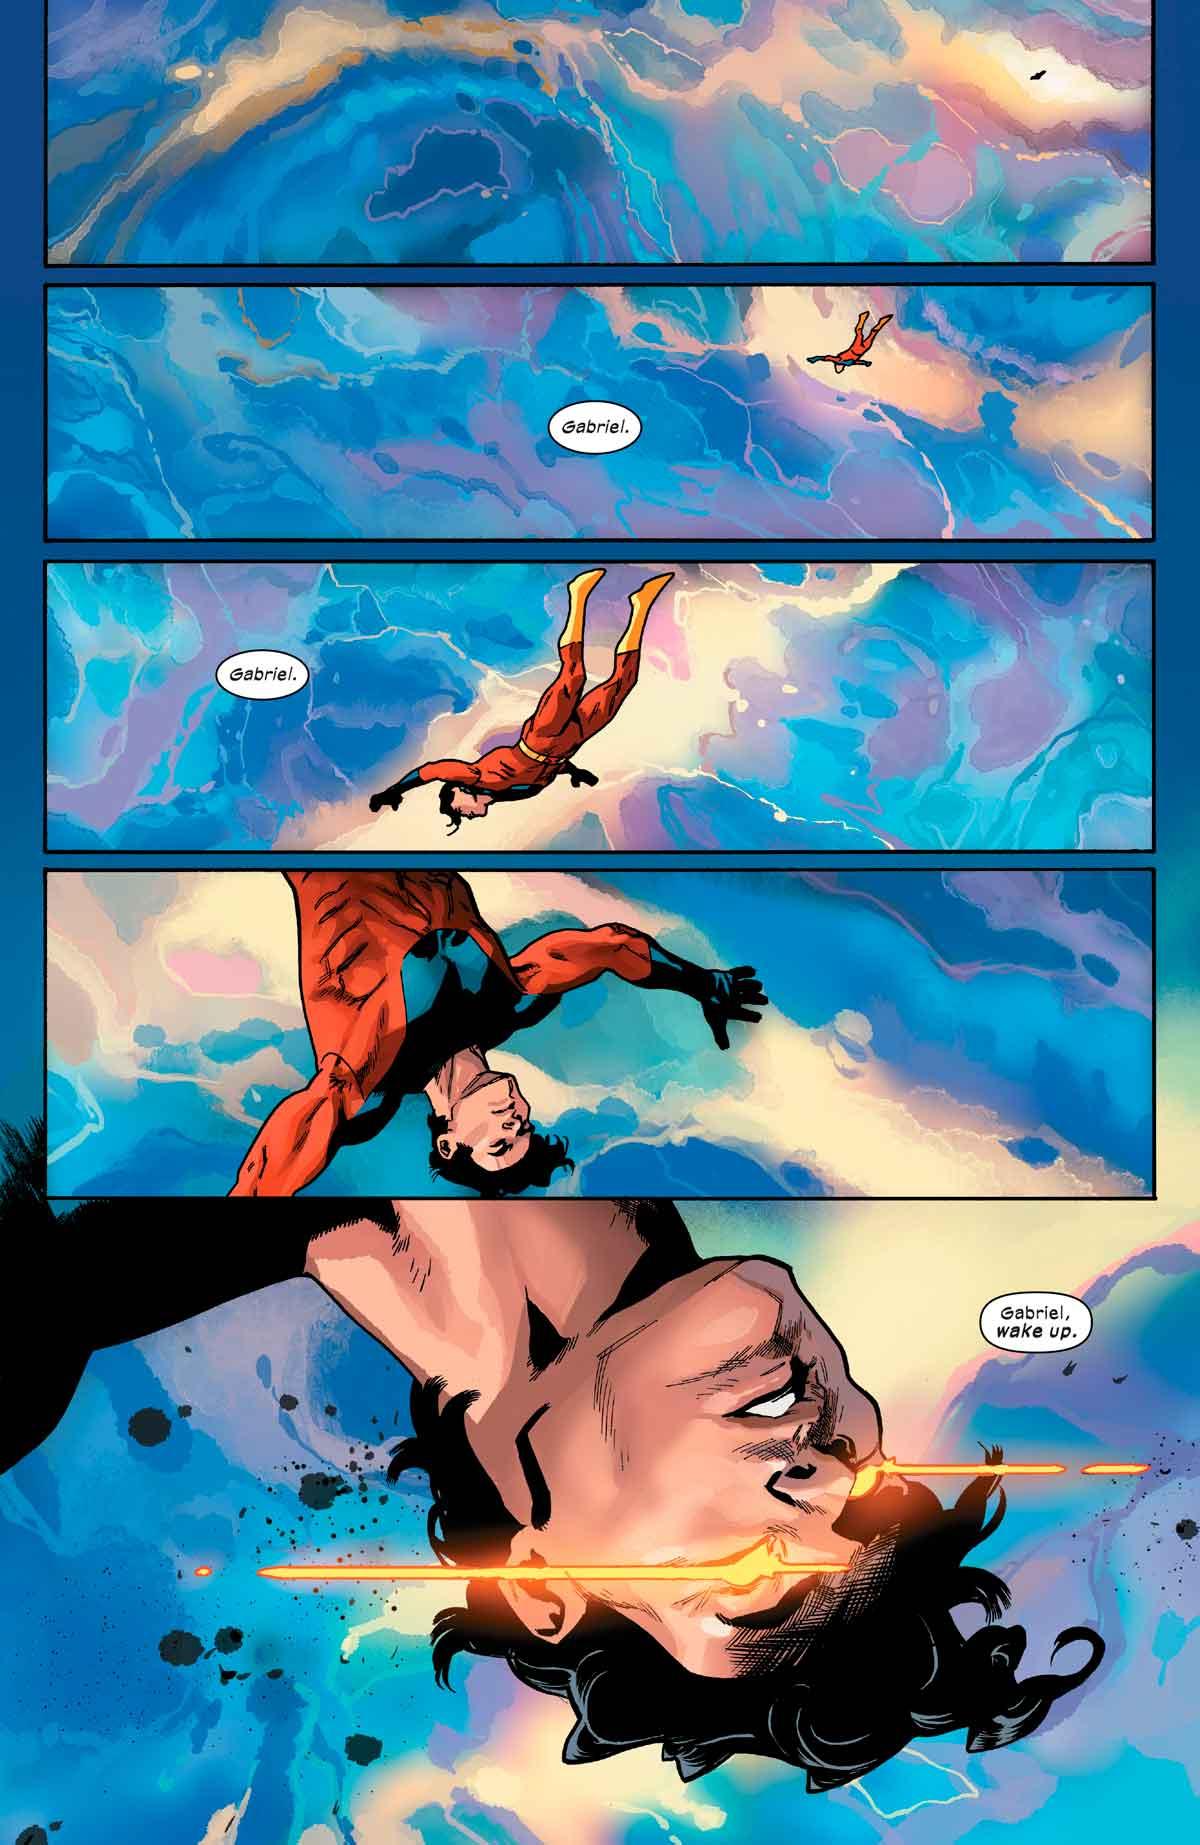 X-Men misterio Vulcan